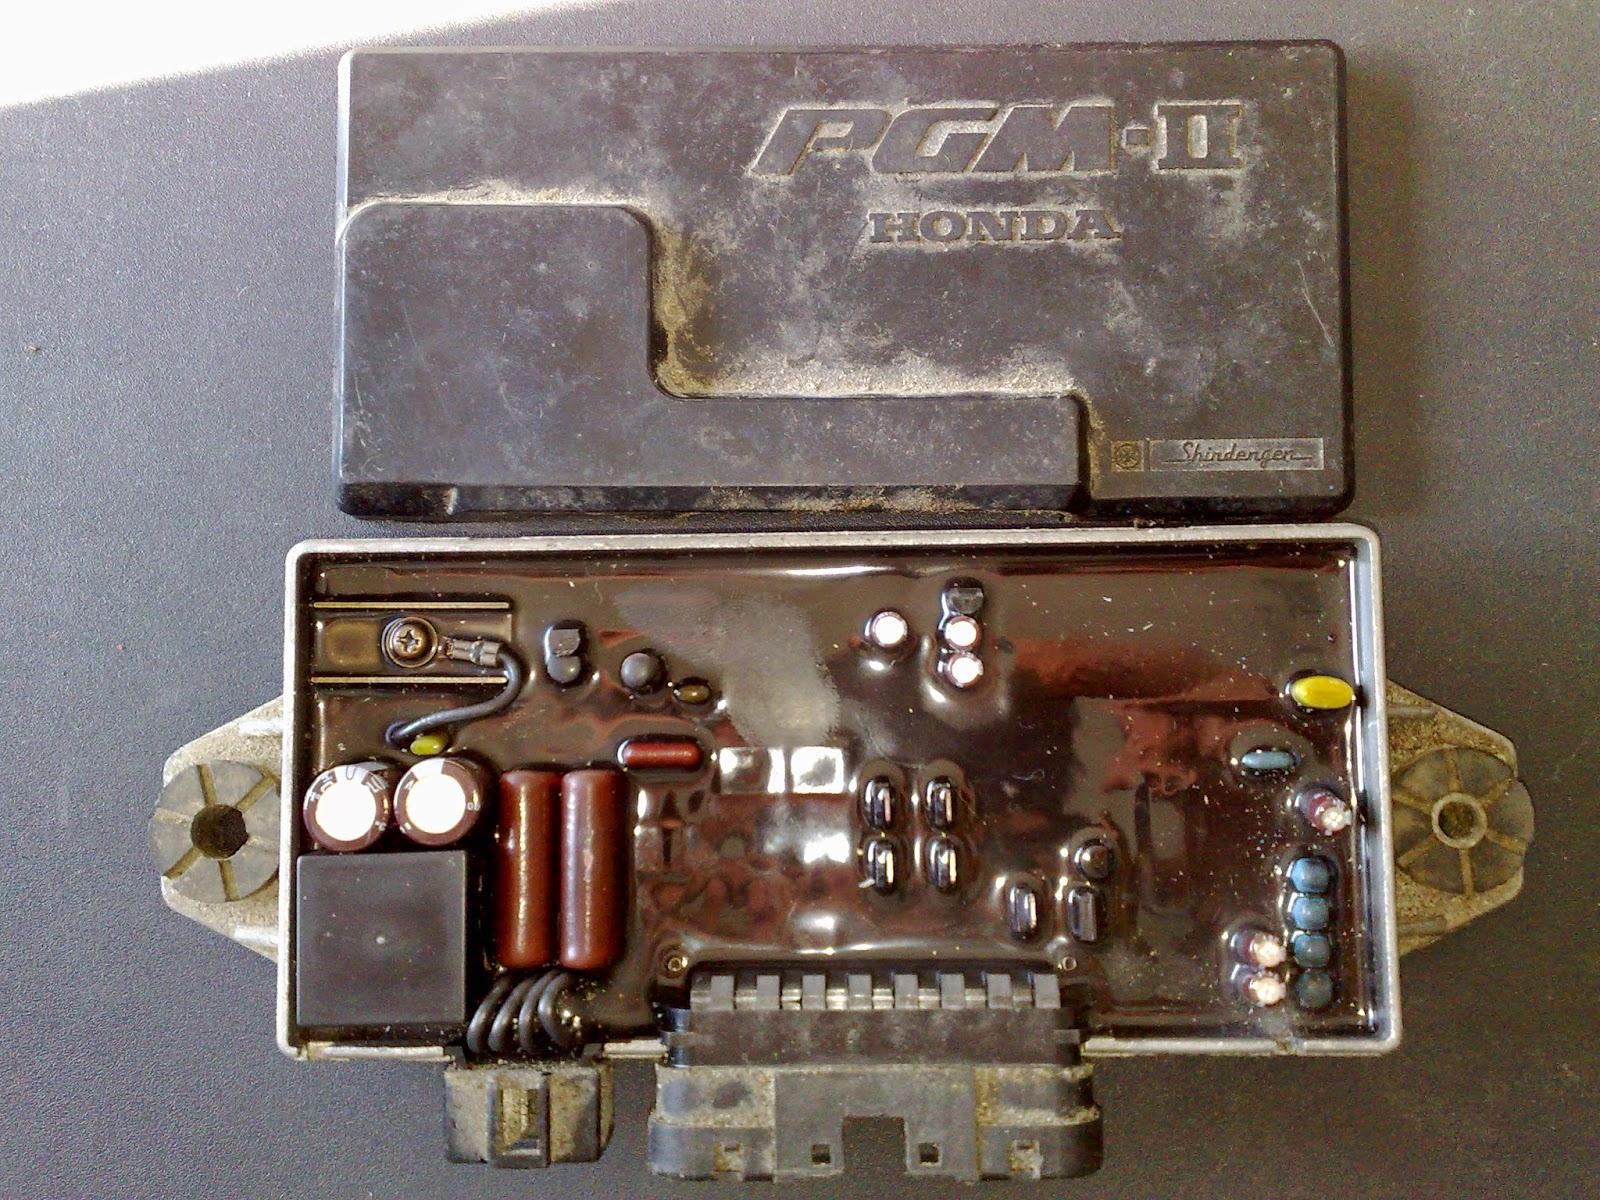 16092014%2BPGM II%2BF3 nsr250 forum honda nsr 250 wiring diagram at cita.asia